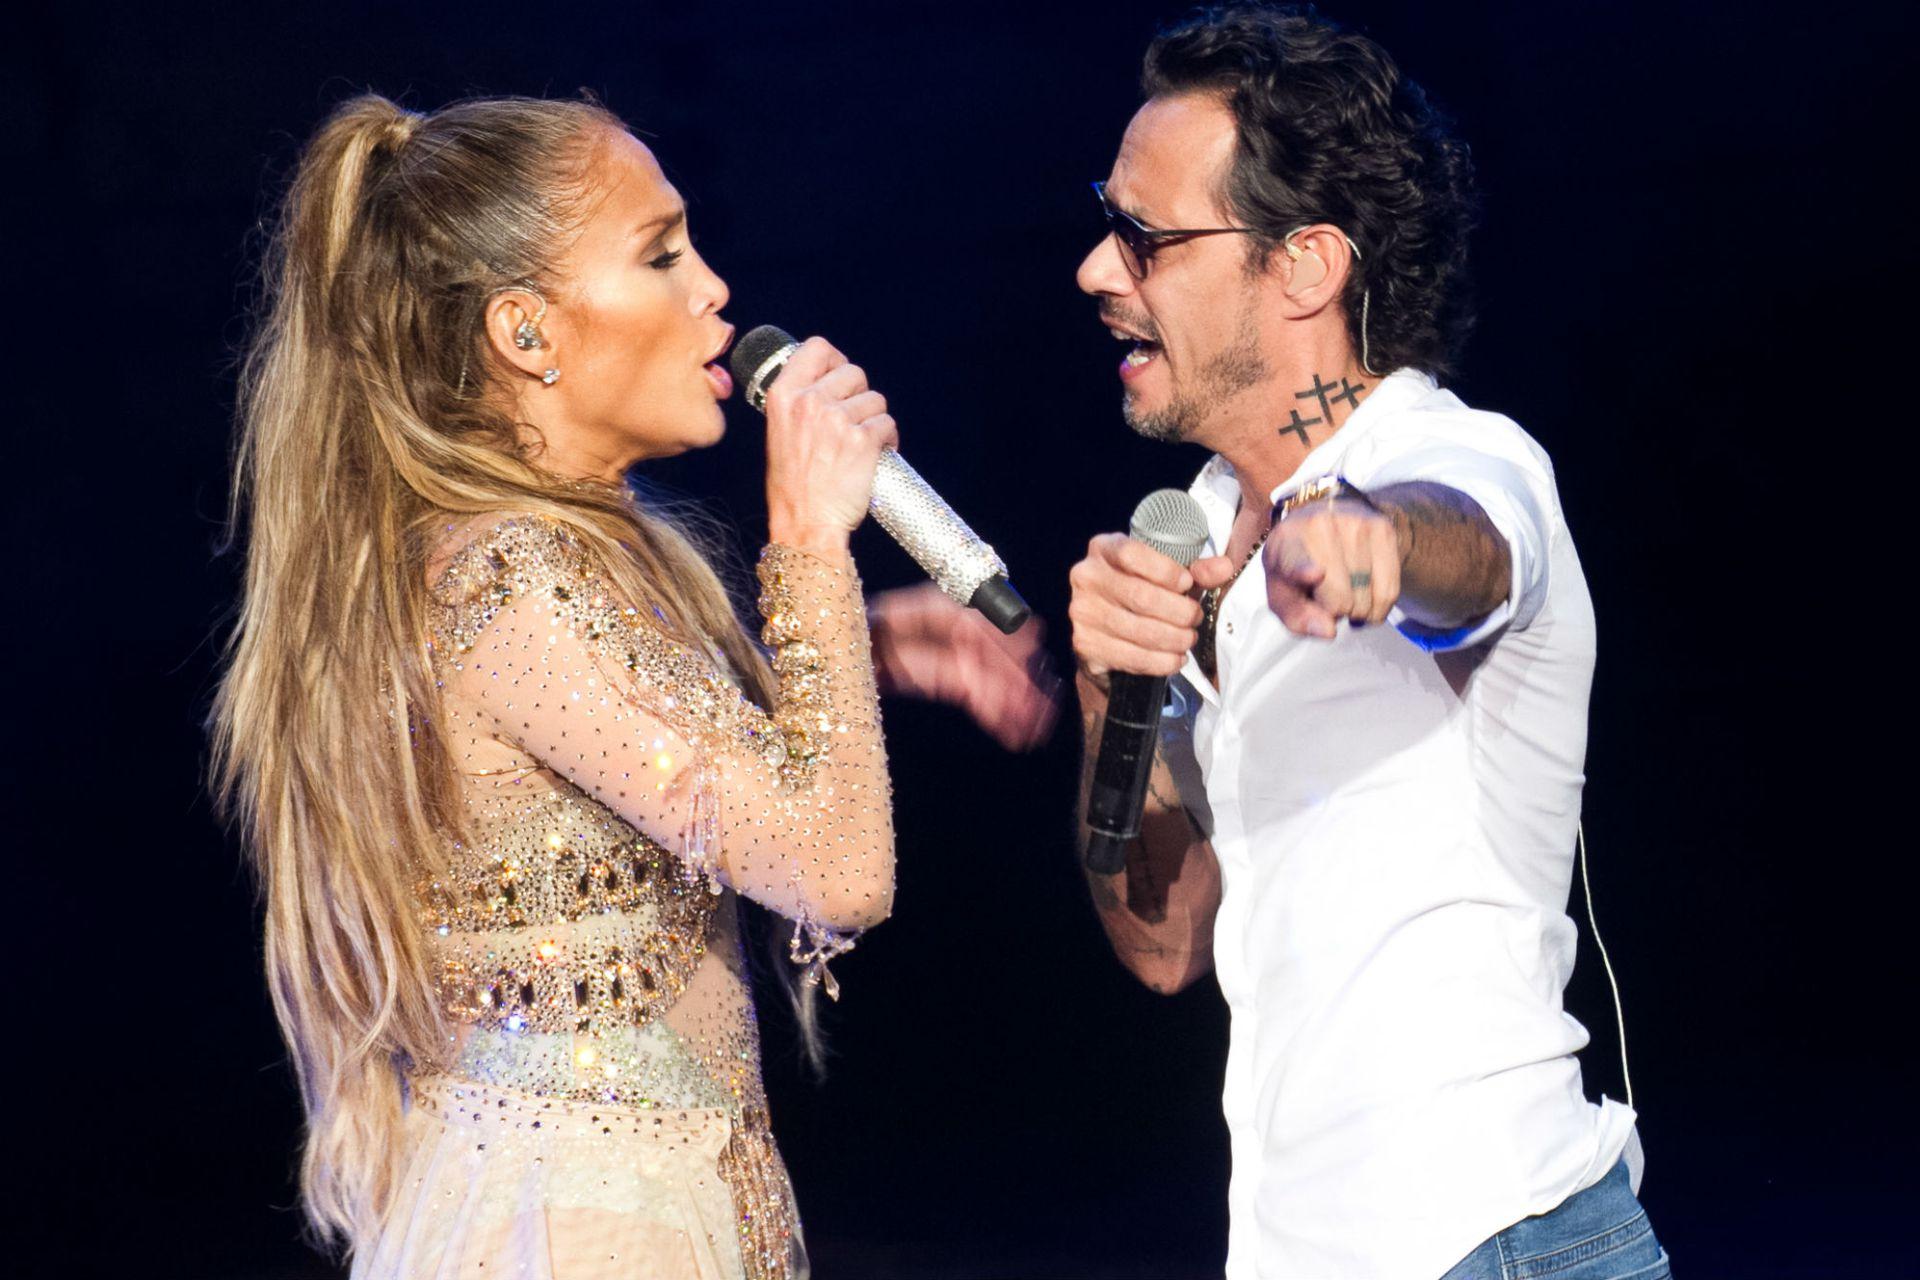 Jennifer Lopez, cantando junto al padre de sus hijos, Marc Anthony, de quien se divorció en 2014